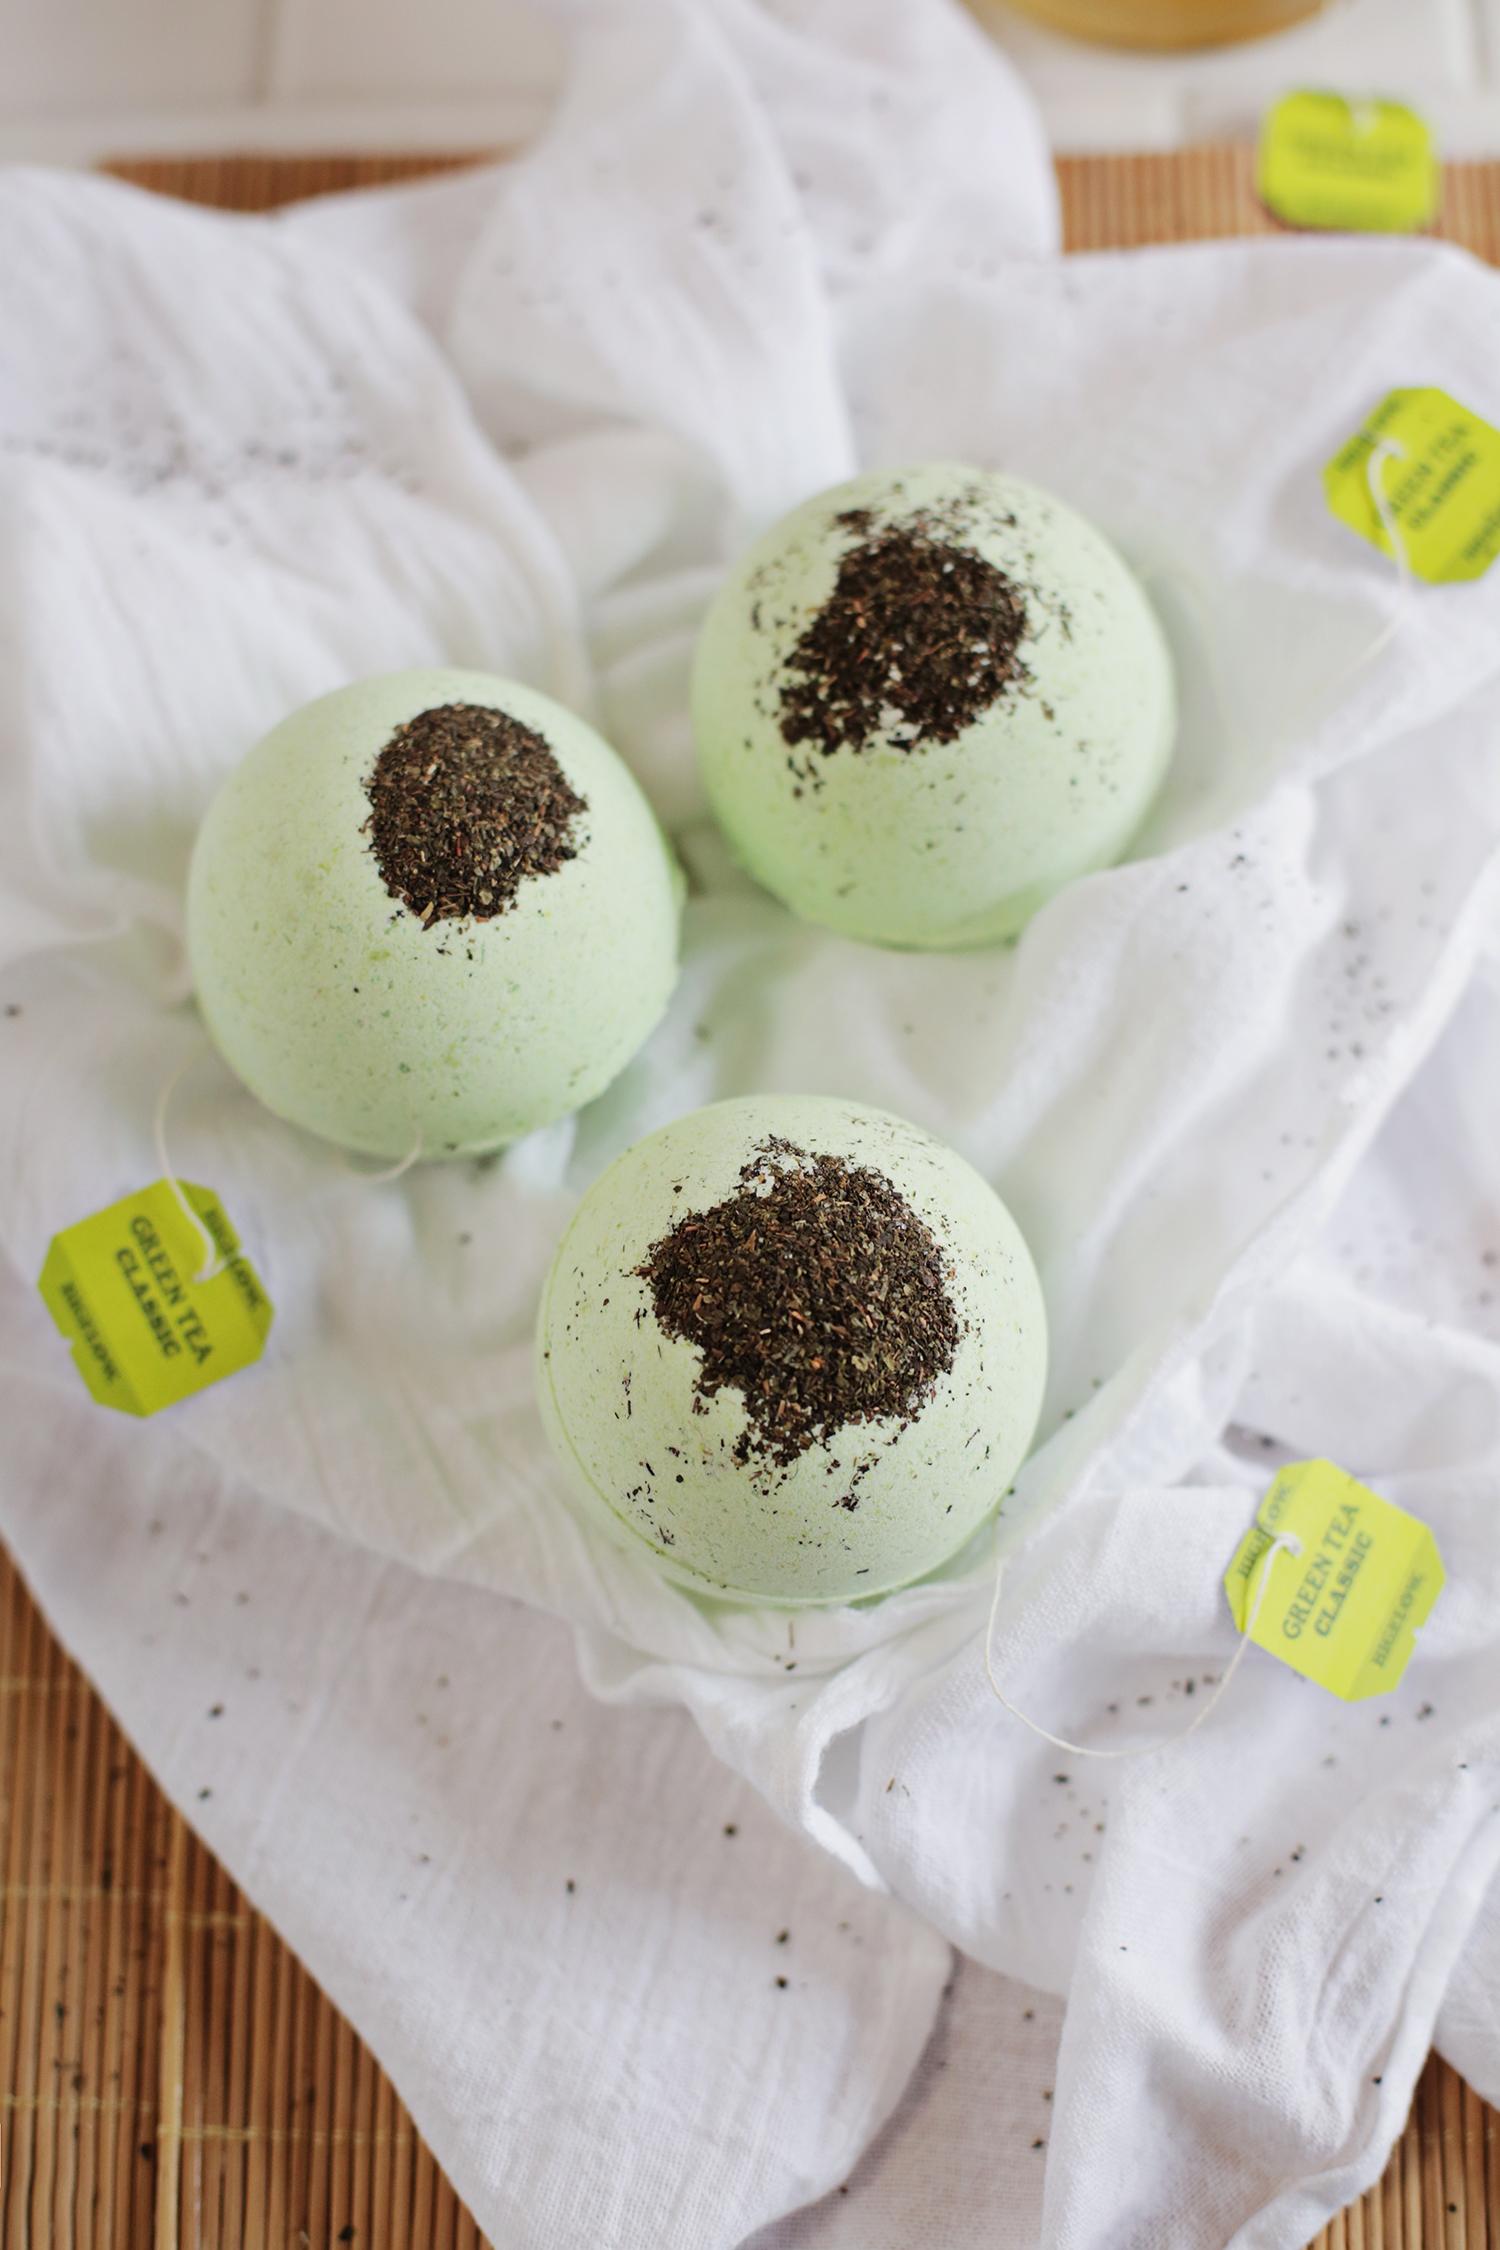 DIY Green Tea and Lemon Bath Bombs (via abeautifulmess.com)